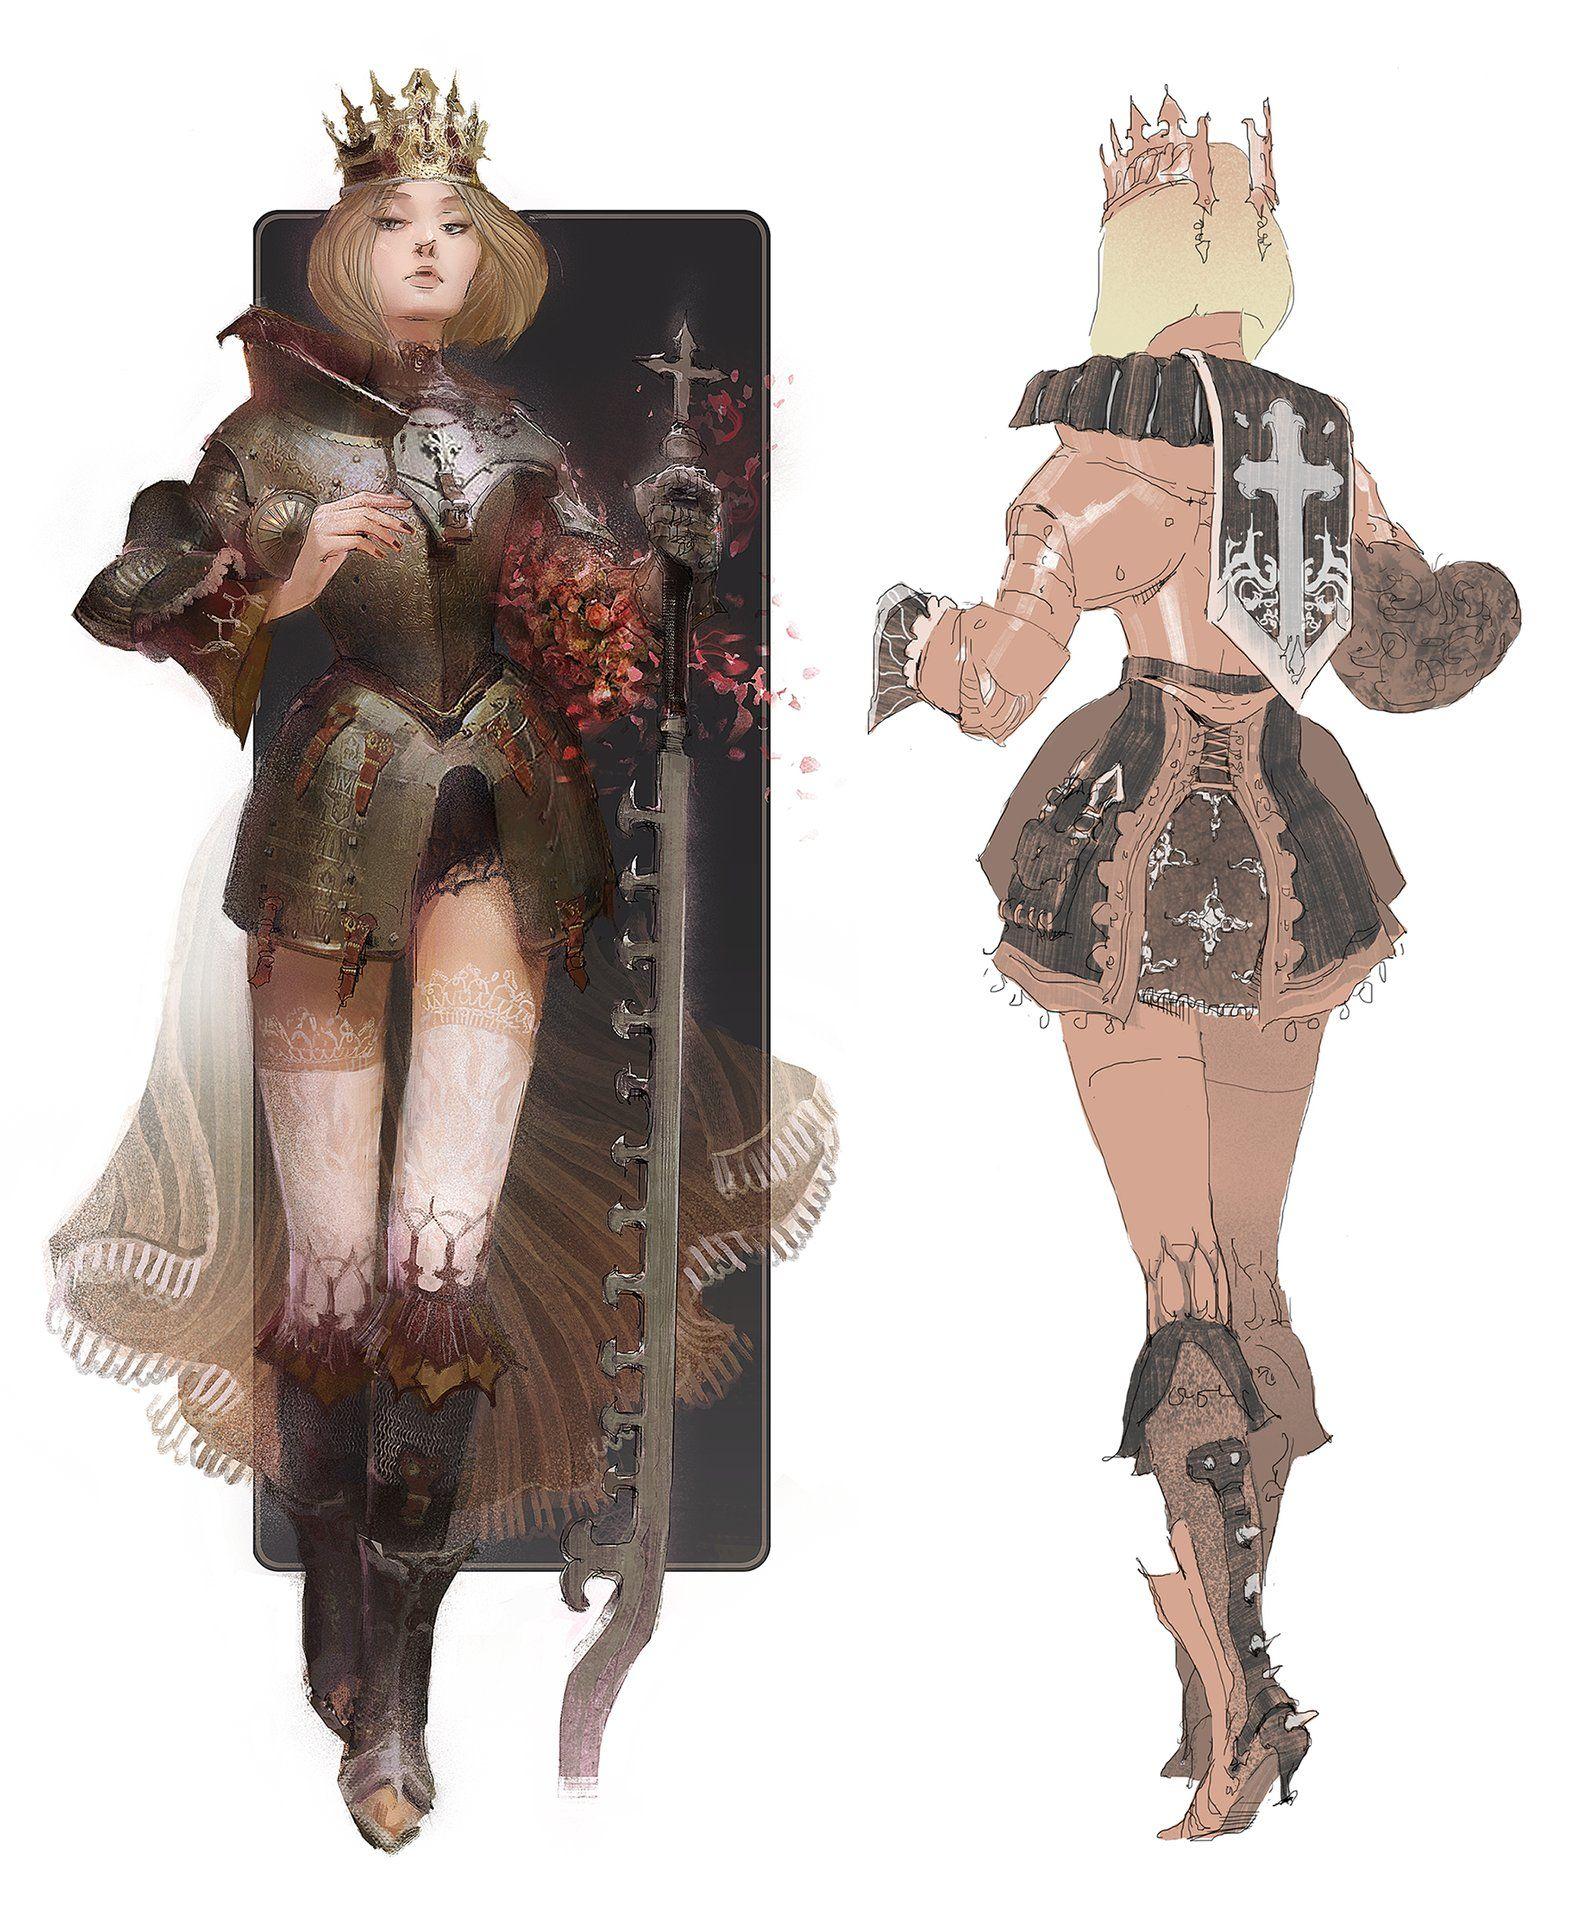 https://www.artstation.com/artwork/maiden-76354279-ef29-42d4-a9b8-09414e2ace4e